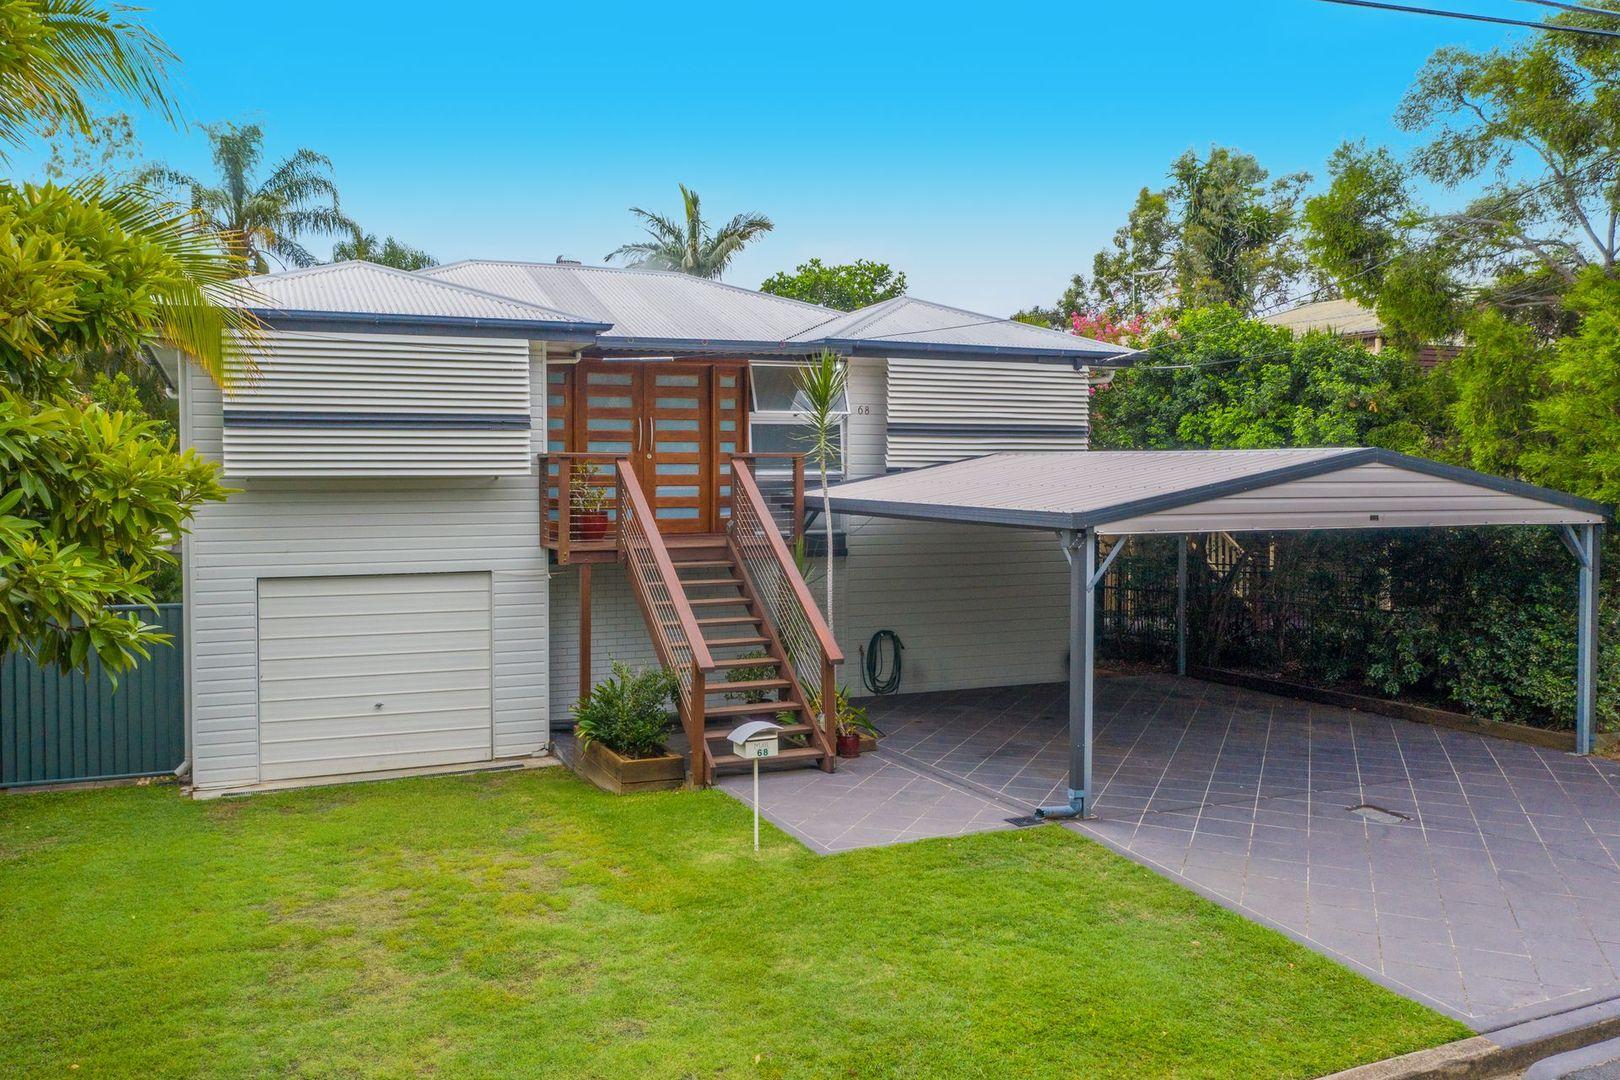 68 Greta Street, Manly West QLD 4179, Image 1